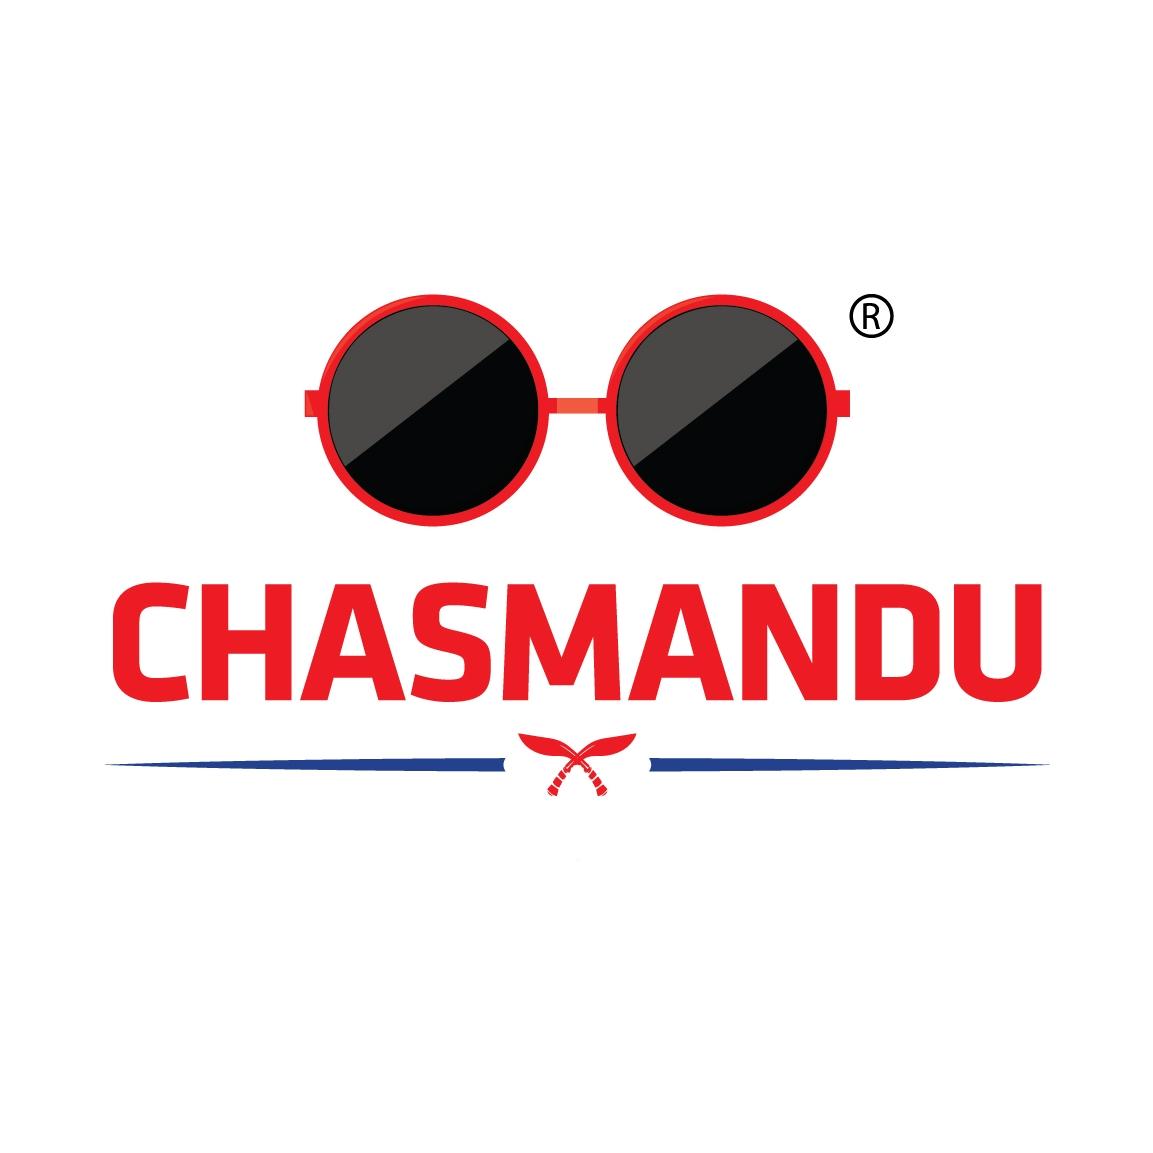 Chasmandu